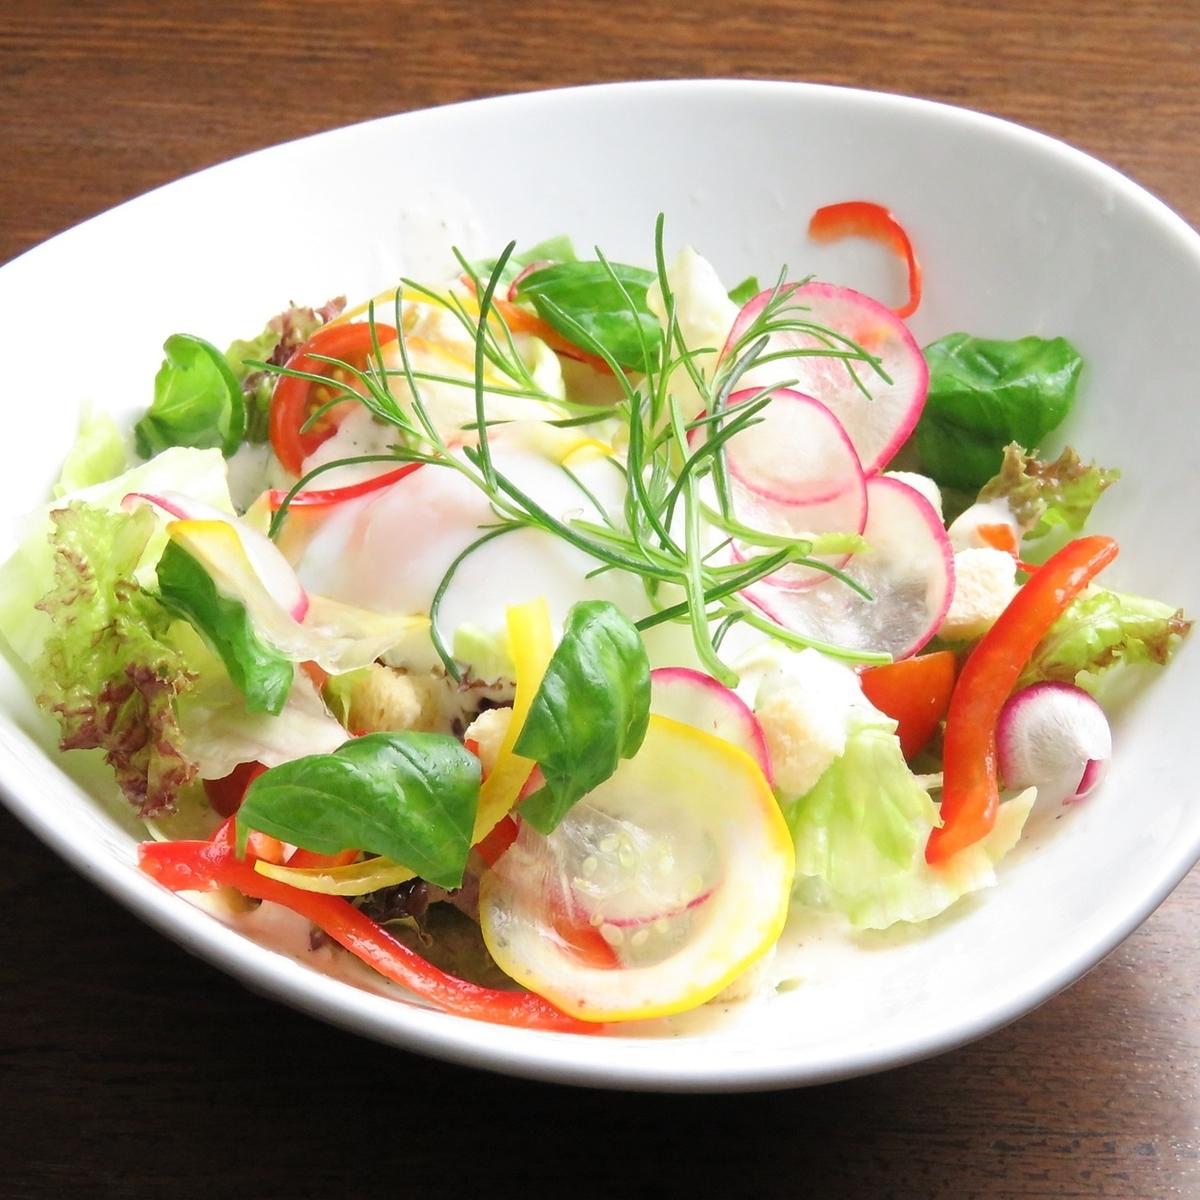 Homemade dressing Caesar salad